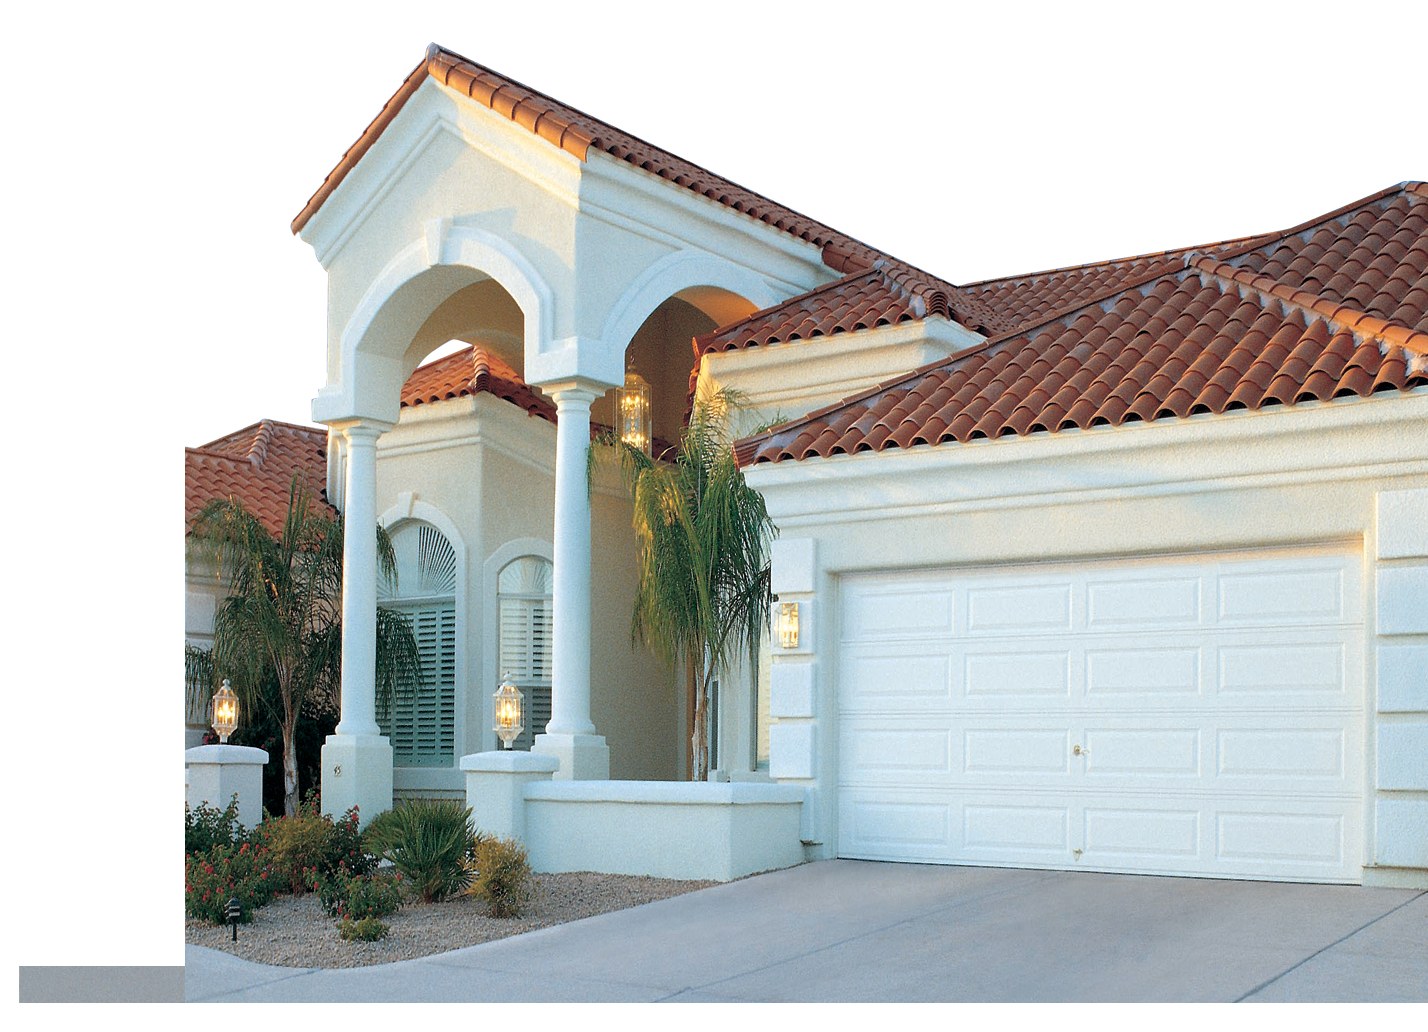 1032 #8C623F Stylish Strength: Amarr Wind Load Garage Doors Amarr Garage Doors save image Amarr Commercial Doors 36671428